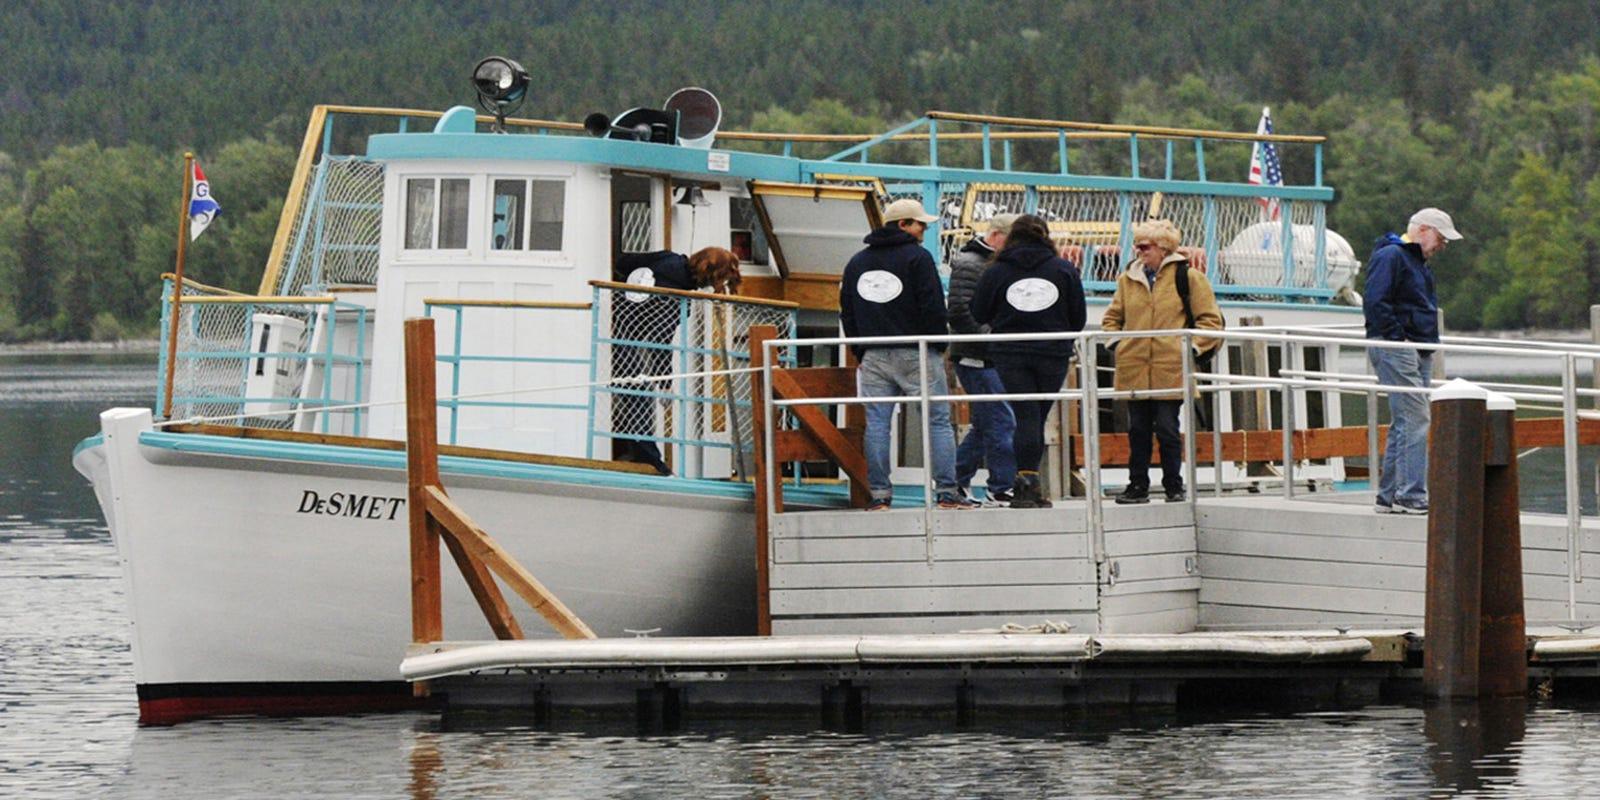 Keeping Glacier National Park's aged wooden boats afloat